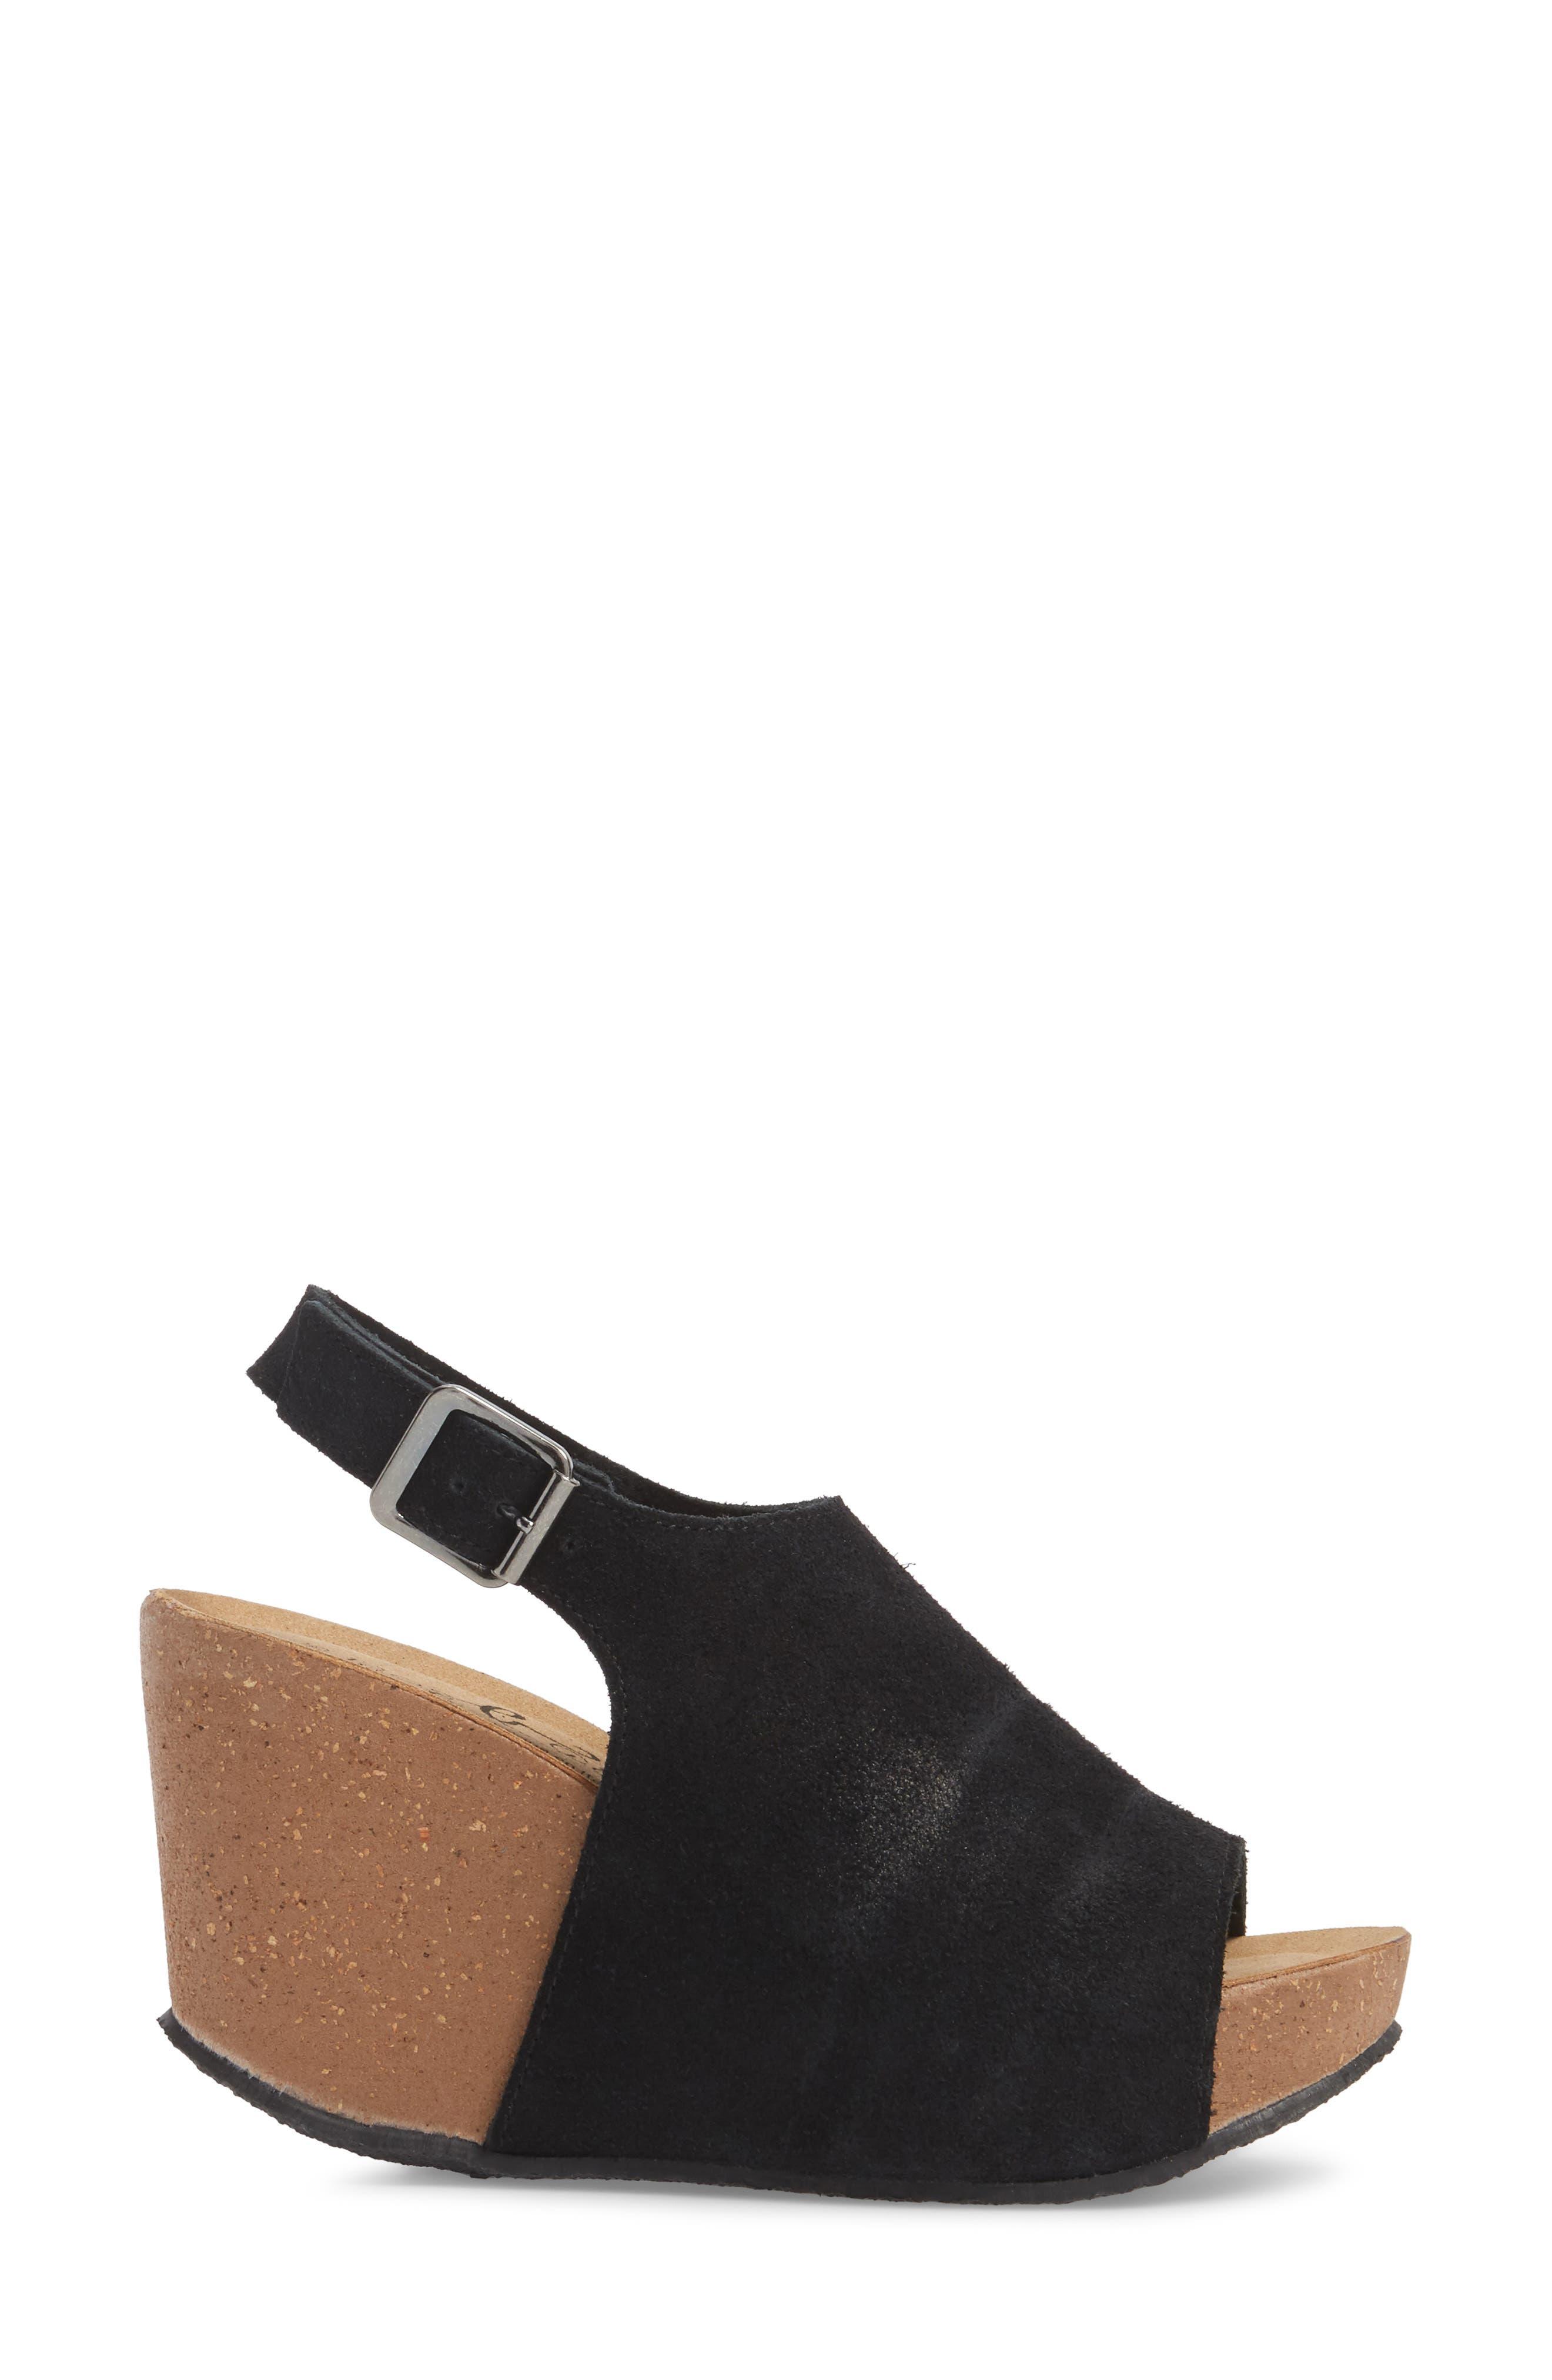 Sheila Platform Wedge Sandal,                             Alternate thumbnail 3, color,                             BLACK NUBUCK